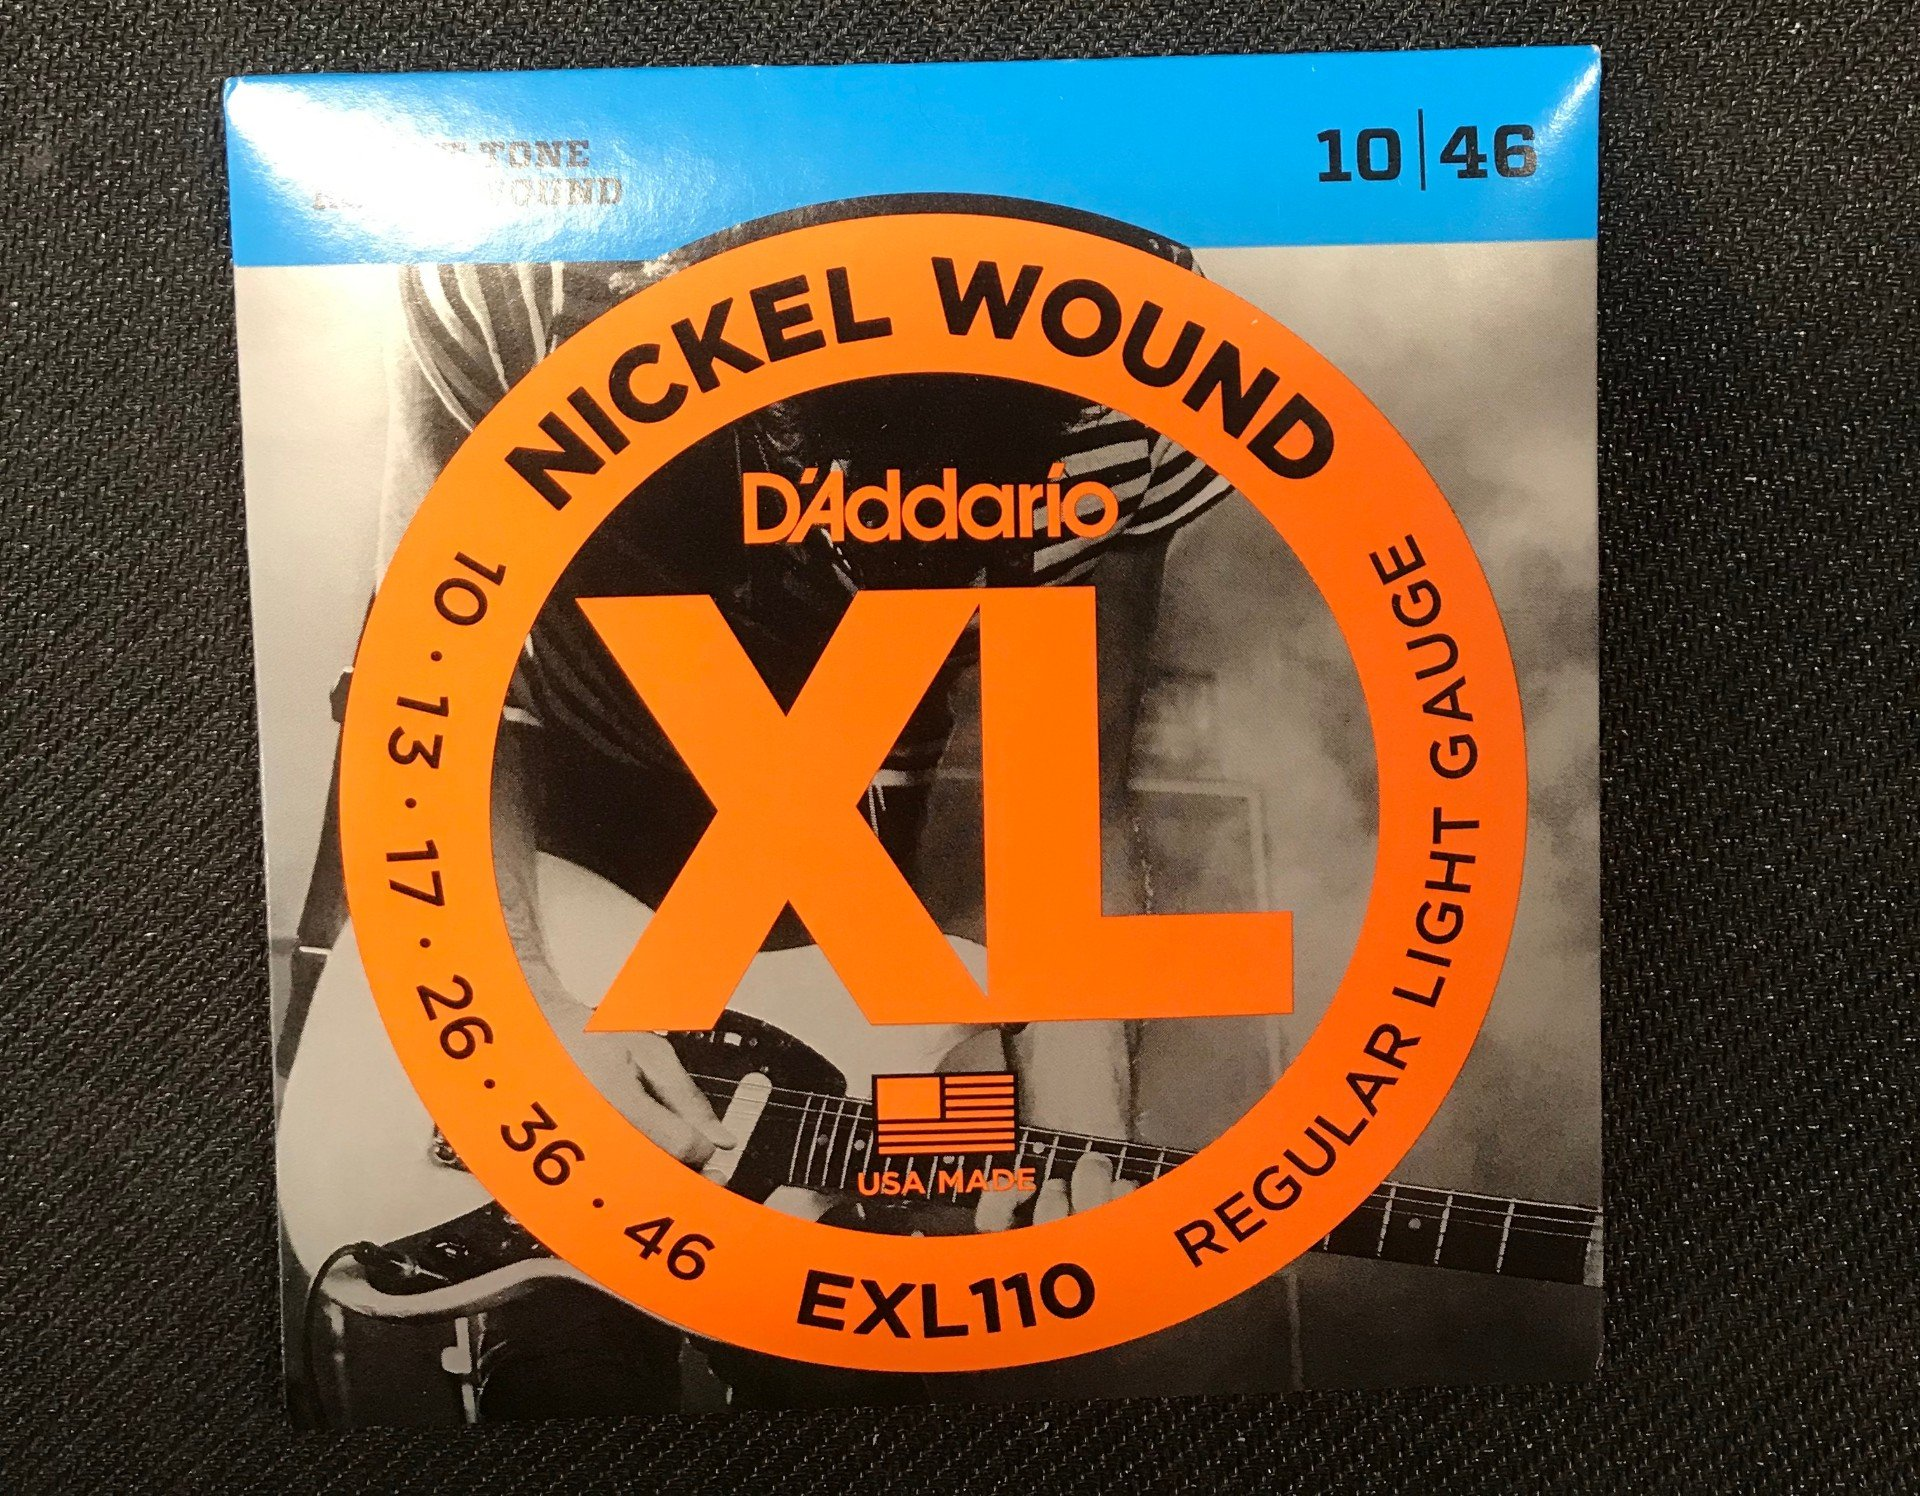 D'addario EXL110 Electric 10 - 46